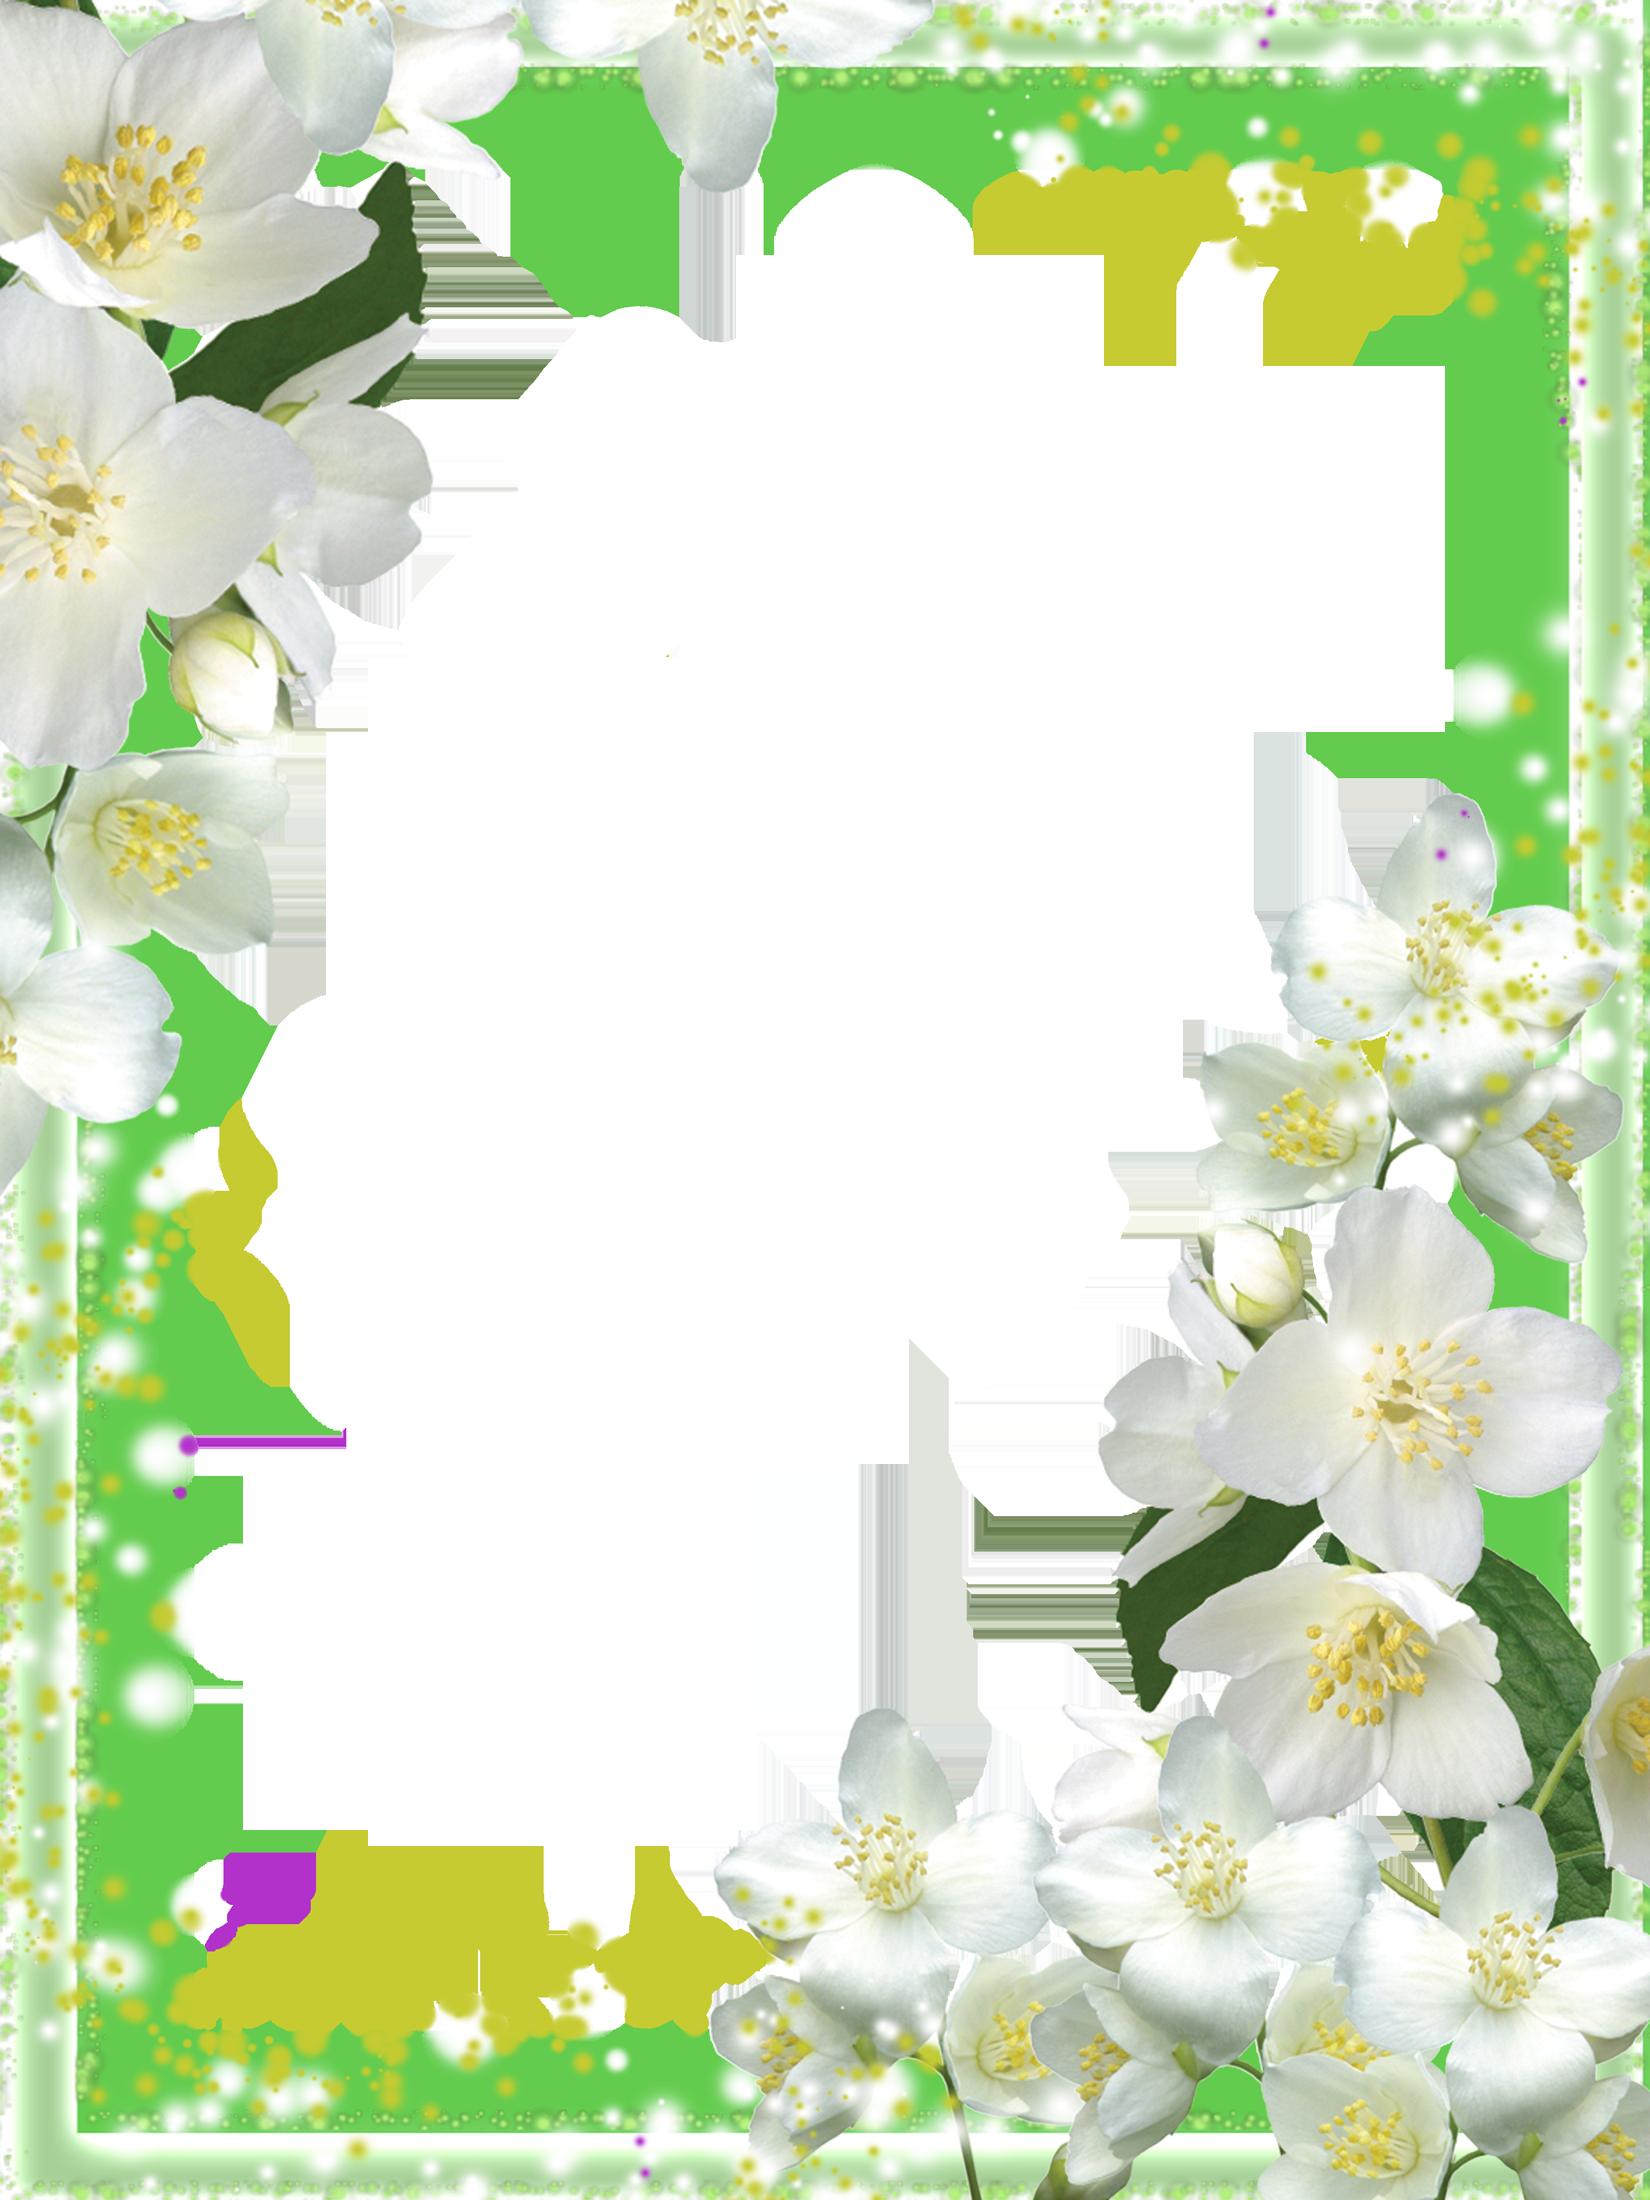 Transparent Green Flowers Frame Flower Frame Green Flowers Flowers